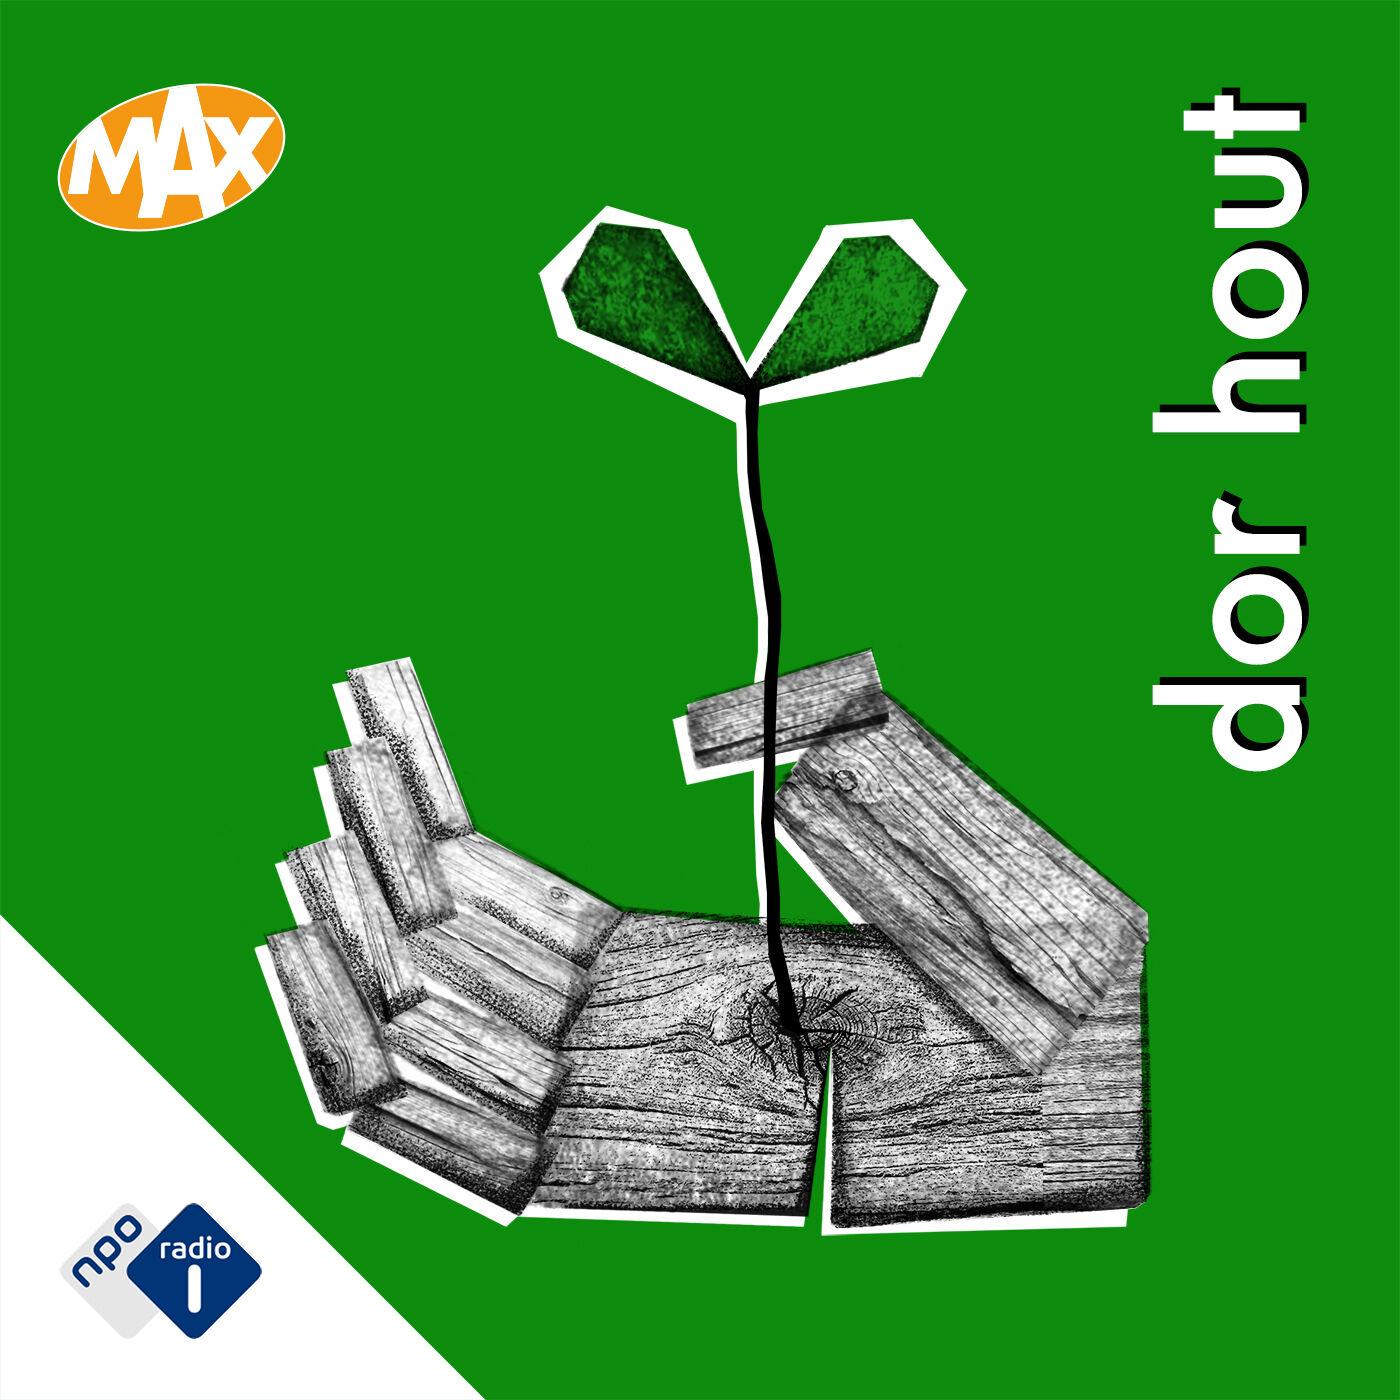 Dor Hout podcast show image